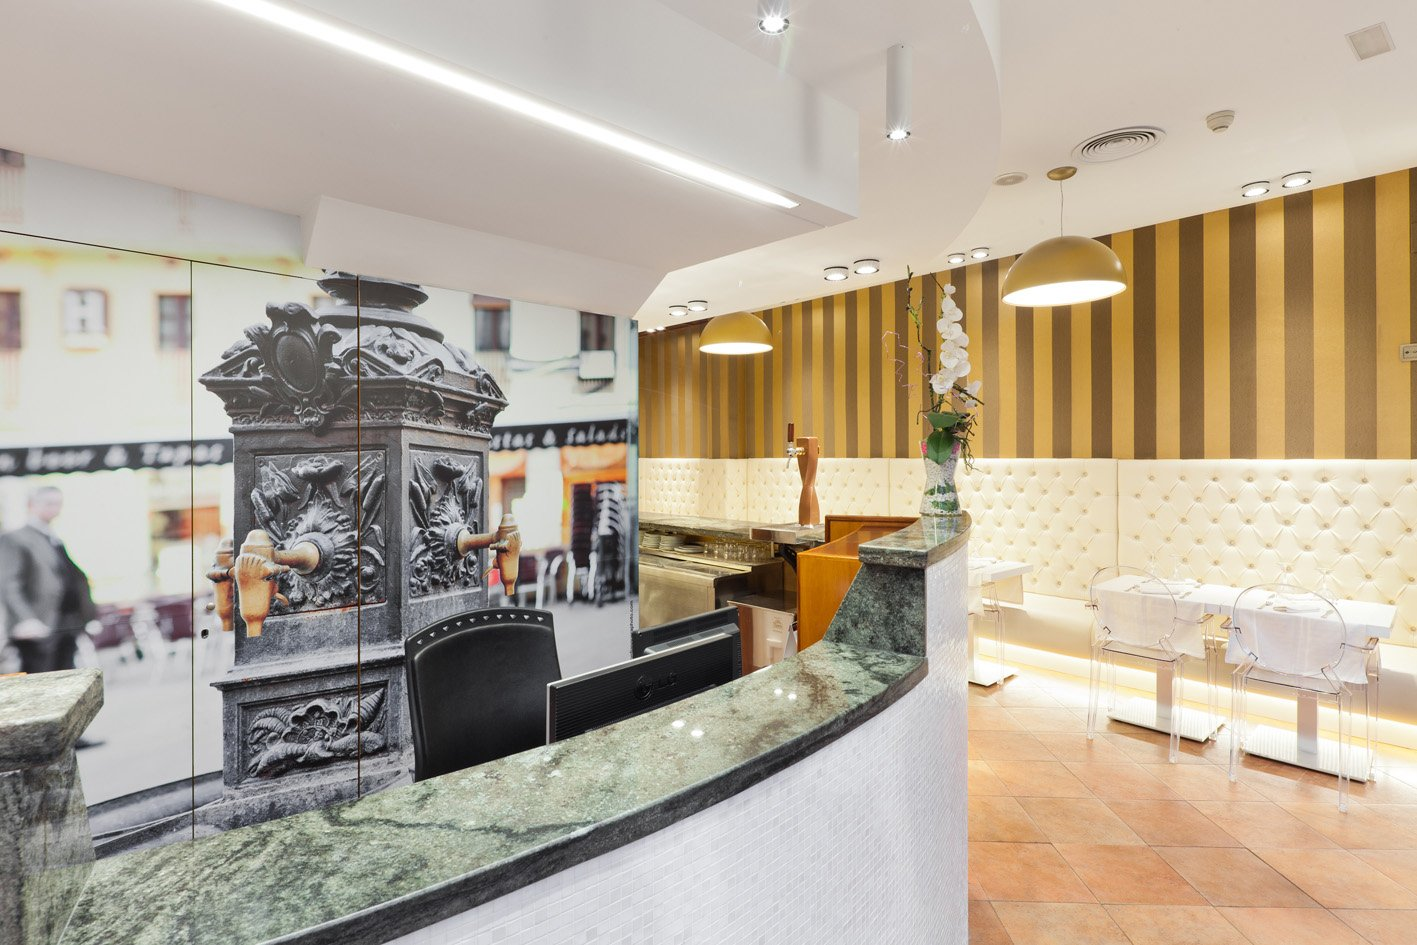 hotel_la_fontnombre_del_documento_29-ab24d5d0f9f9495a7f393439947dc421